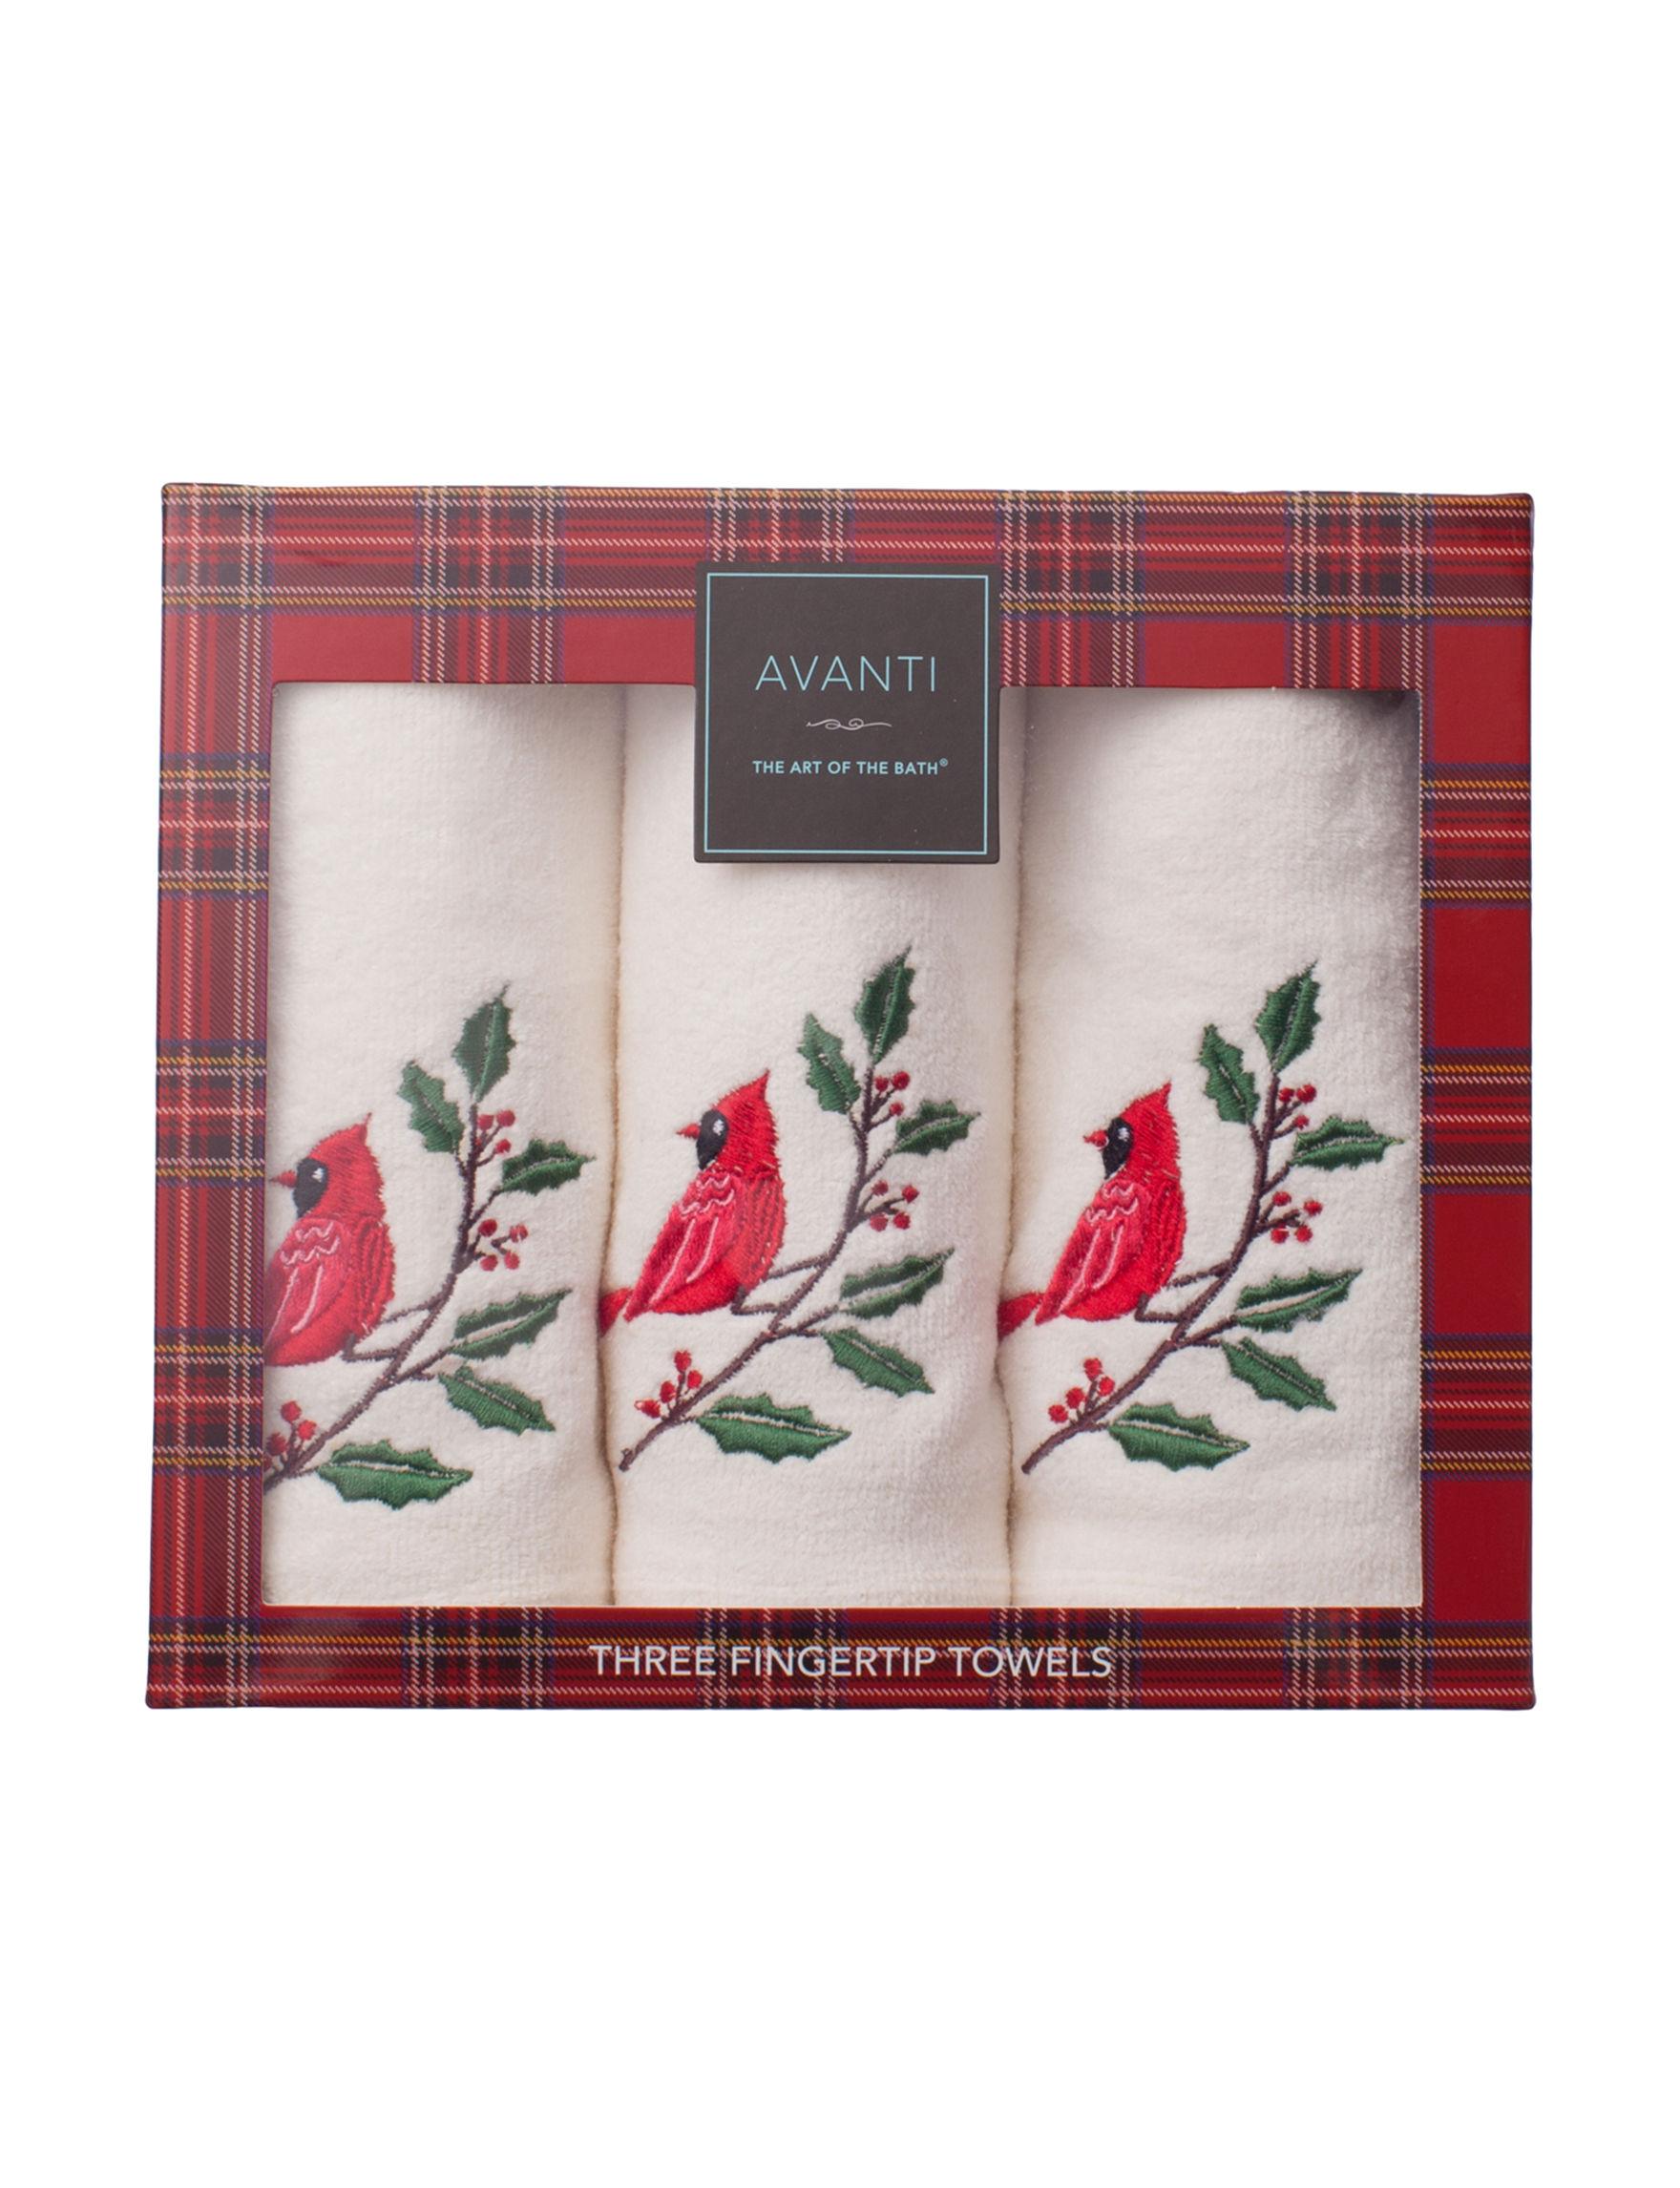 Avanti White / Red Fingertip Towels Towel Sets Towels